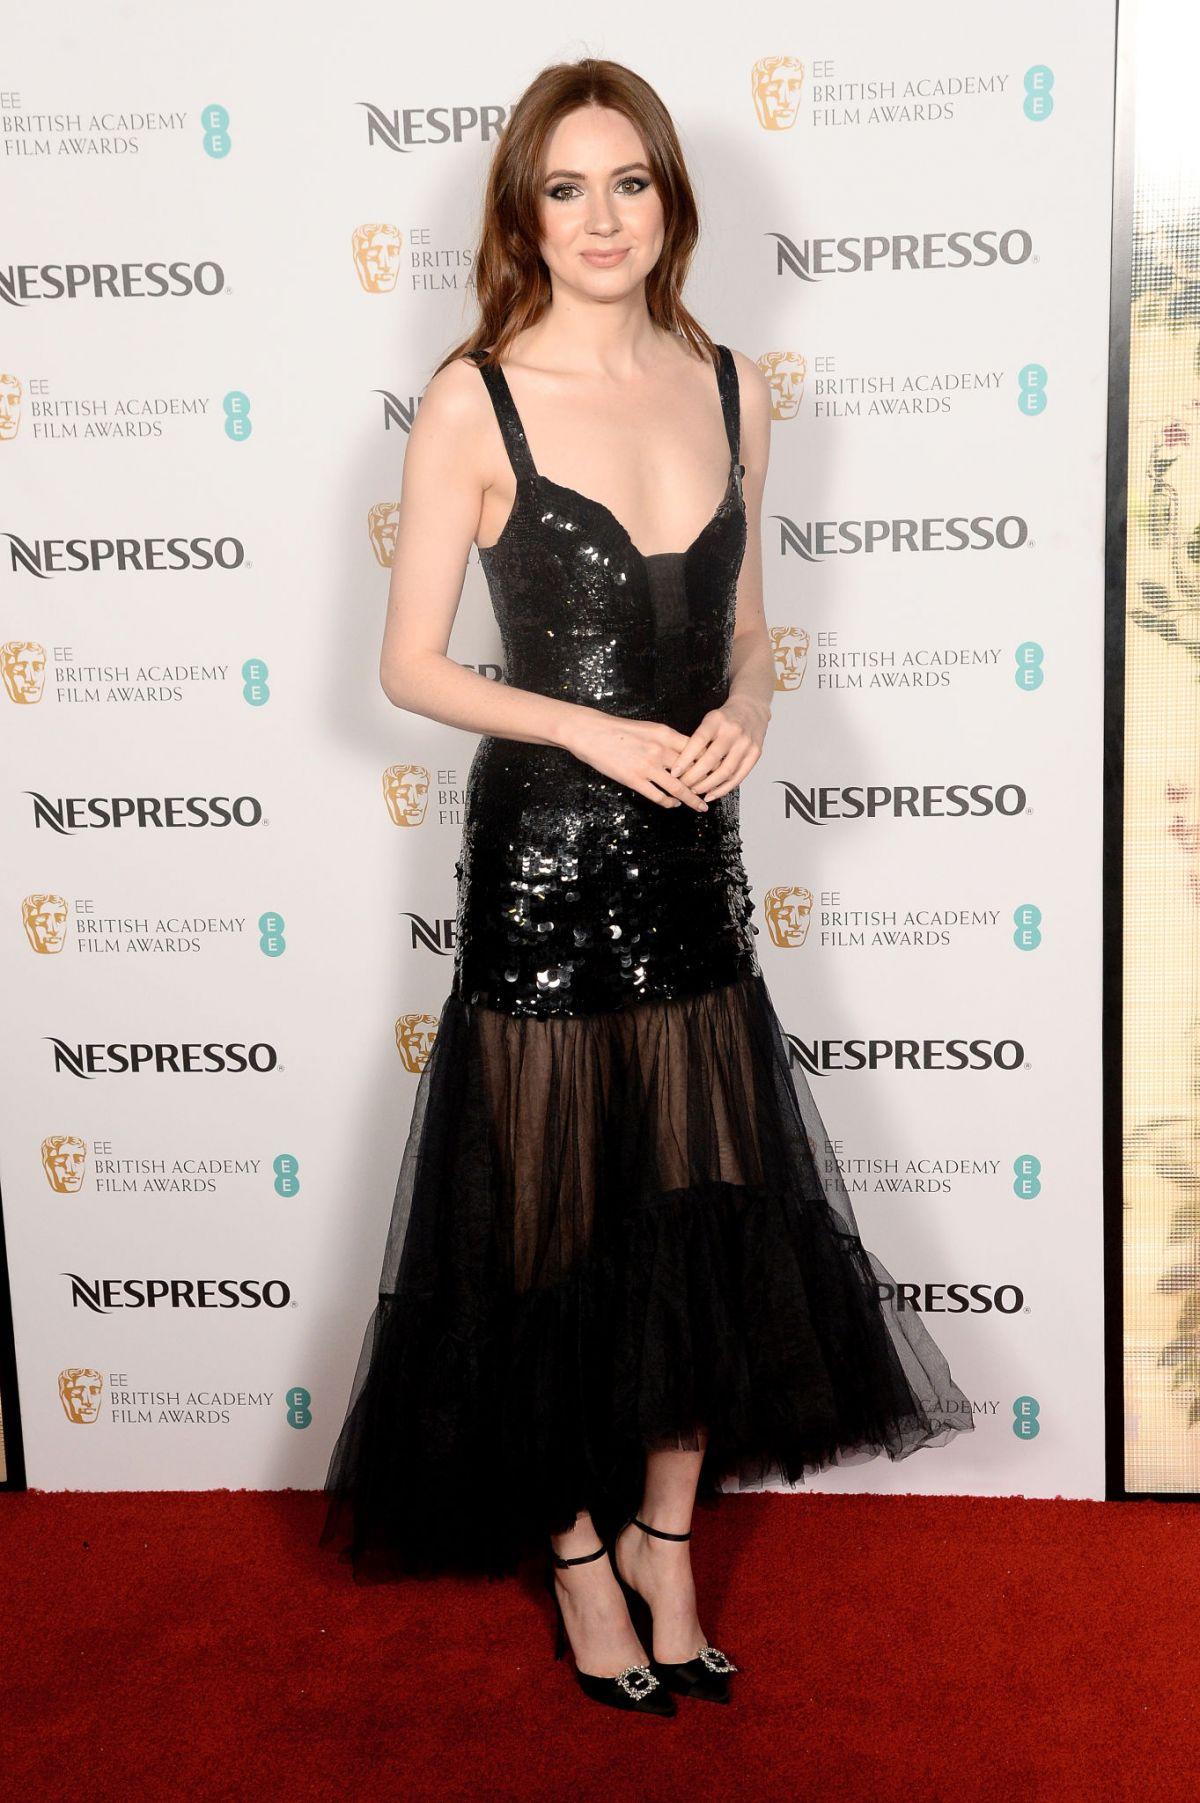 ¿Cuánto mide Karen Gillan? - Real height Karen-gillan-at-ee-british-academy-film-awards-nominees-party-in-london-11